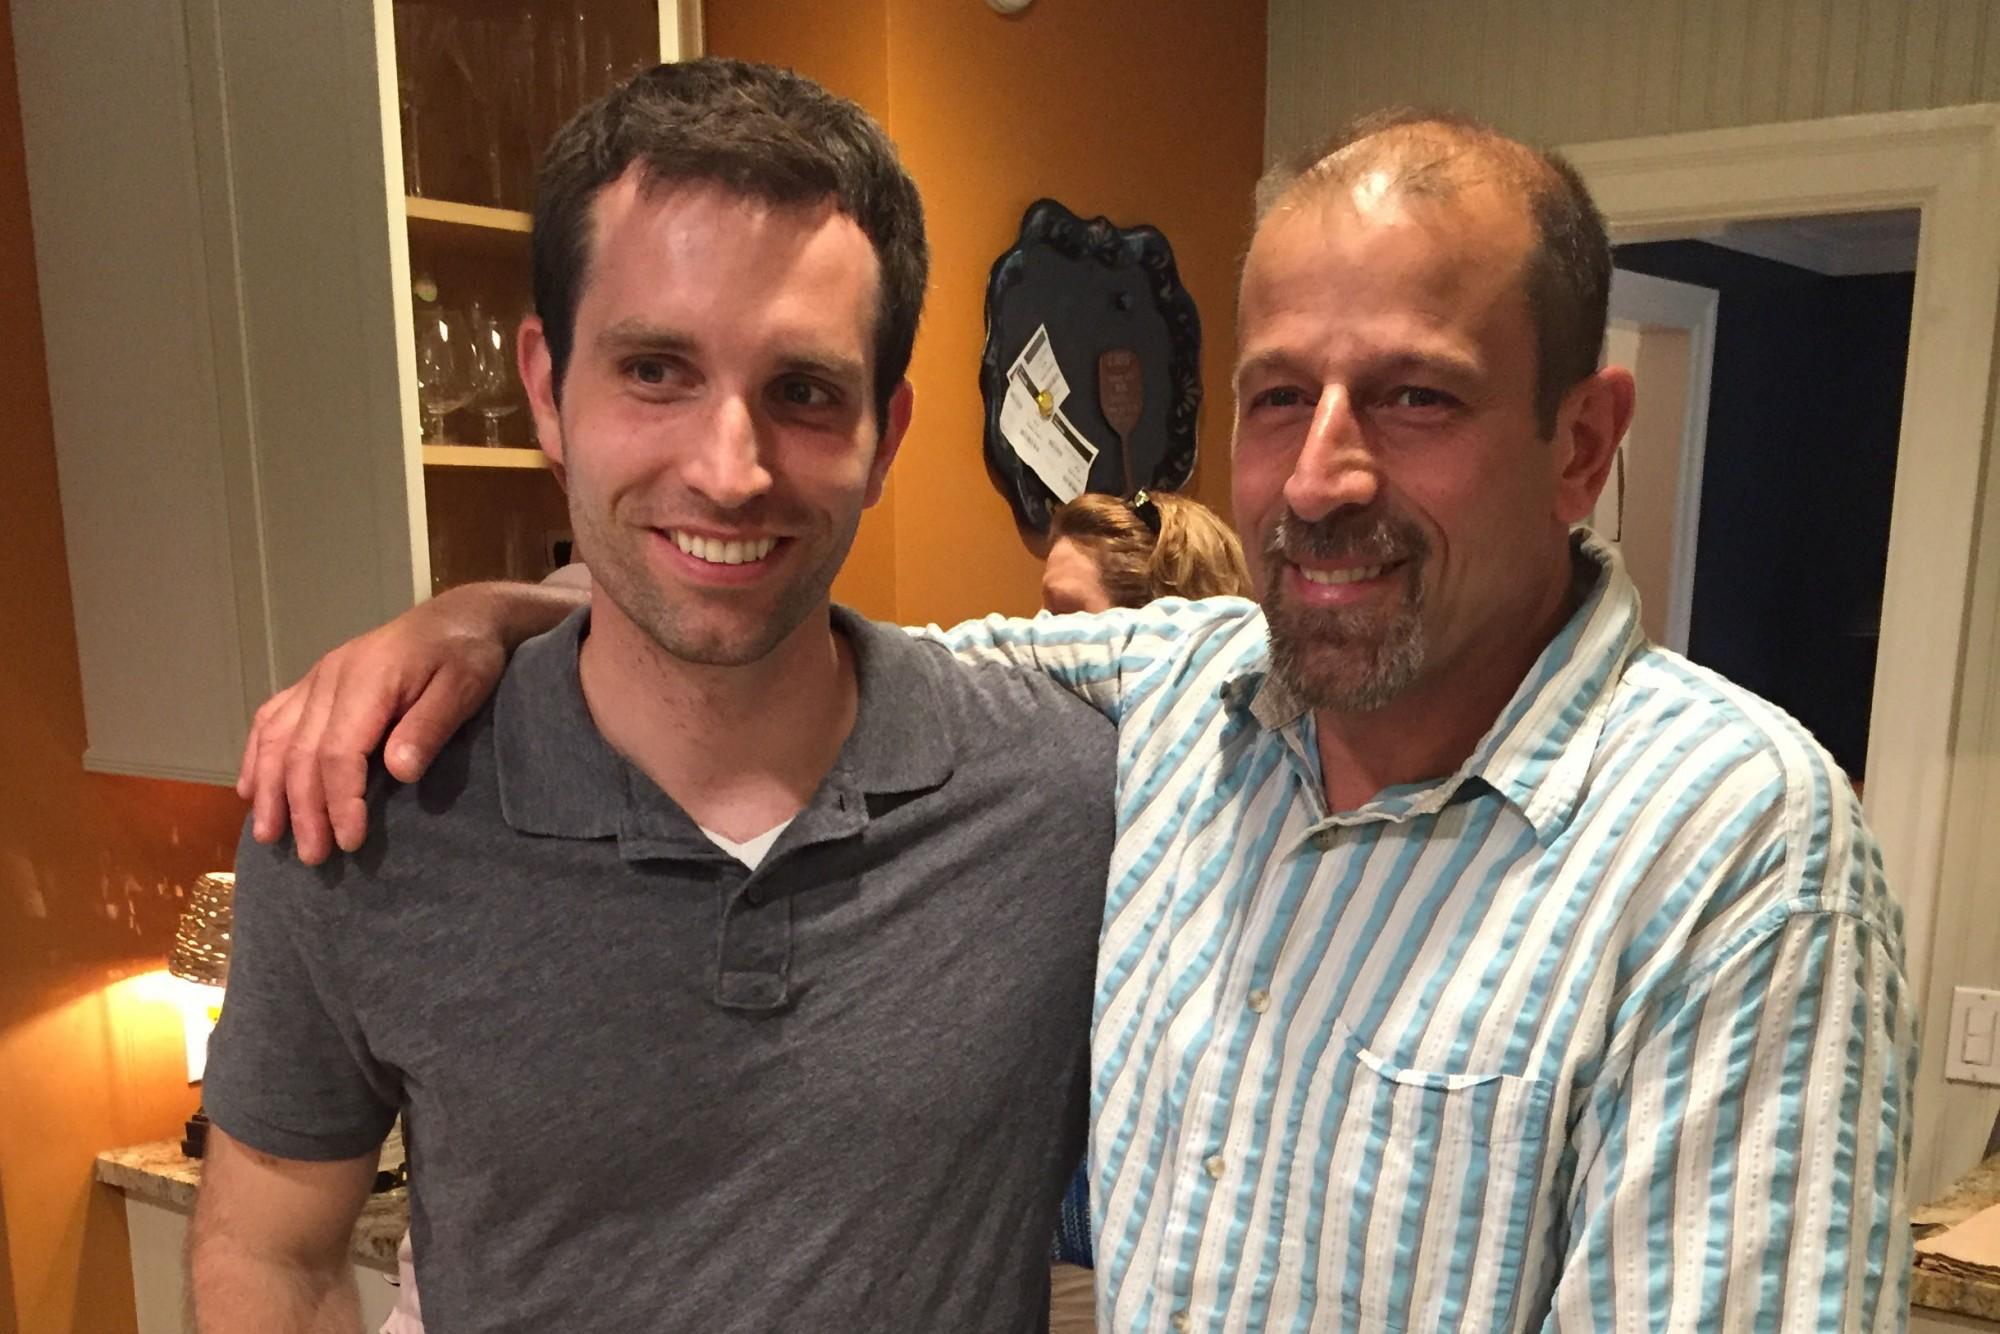 Ben Elliot, left, the bone marrow donor, and Doug Parisano, right. Courtesy of Gina Elliot.